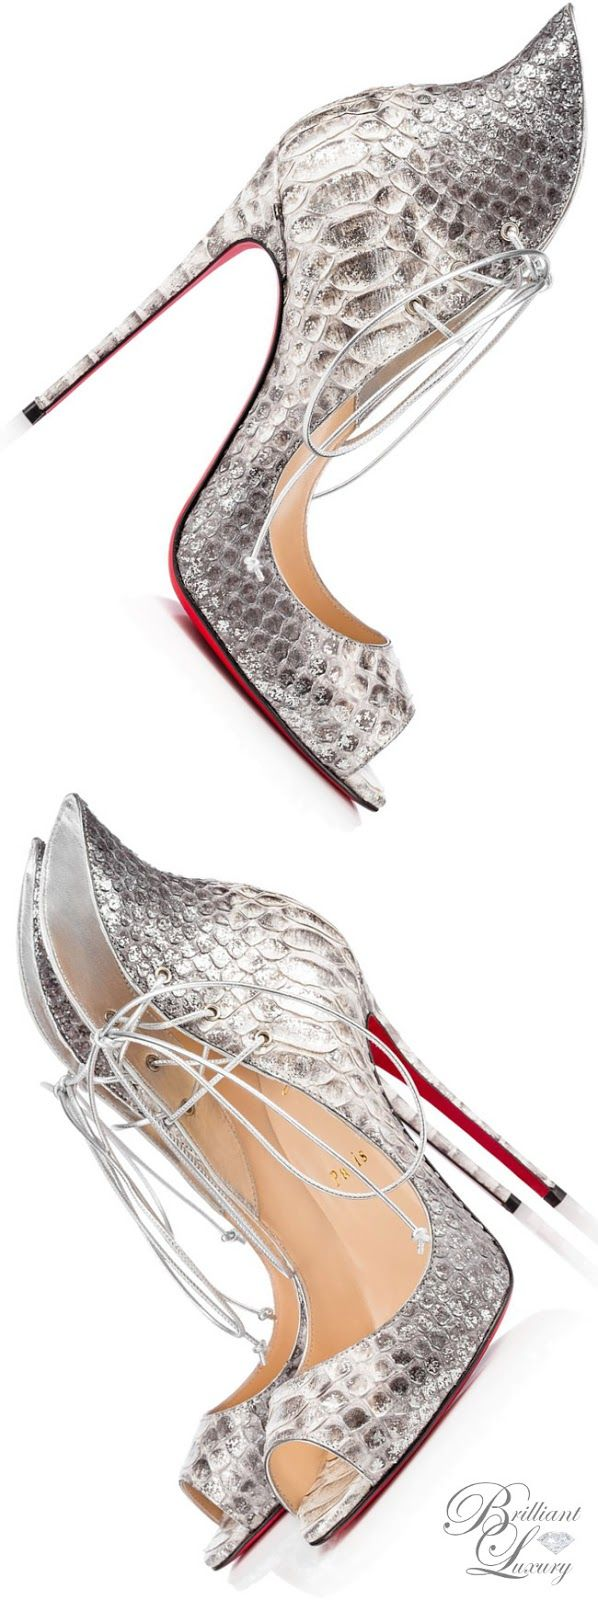 Brilliant Luxury by Emmy DE ♦ Christian Louboutin 'Megavamp' Python Br…